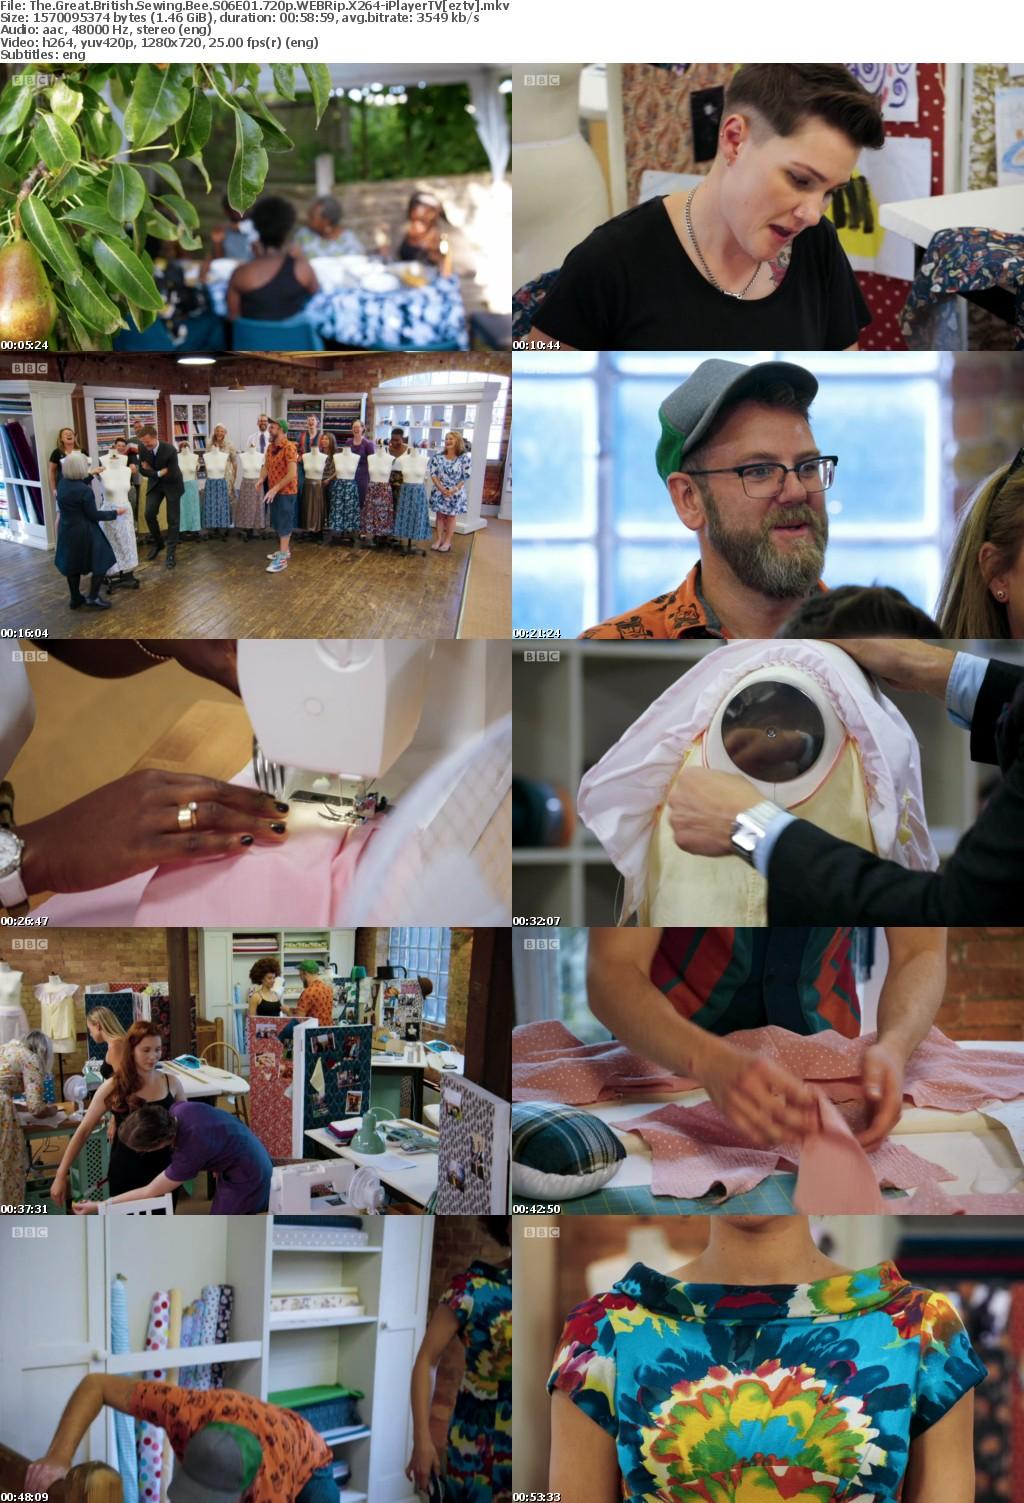 The Great British Sewing Bee S06E01 720p WEBRip X264-iPlayerTV